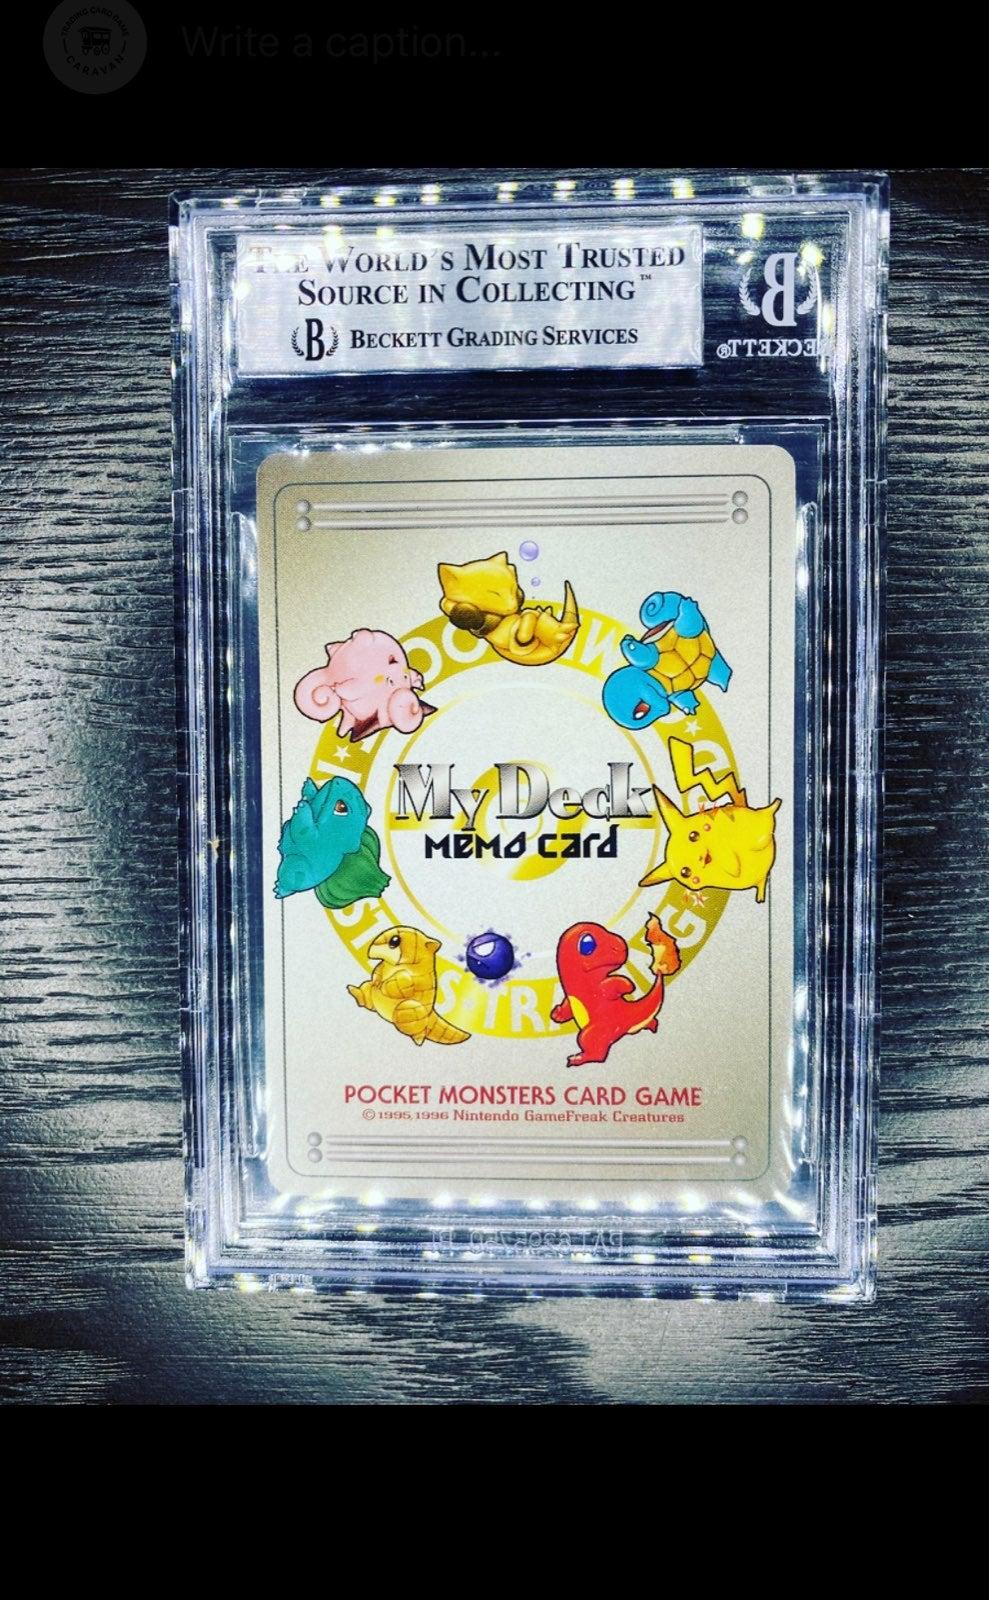 Japanese My Deck Memo Card BGS 8.5